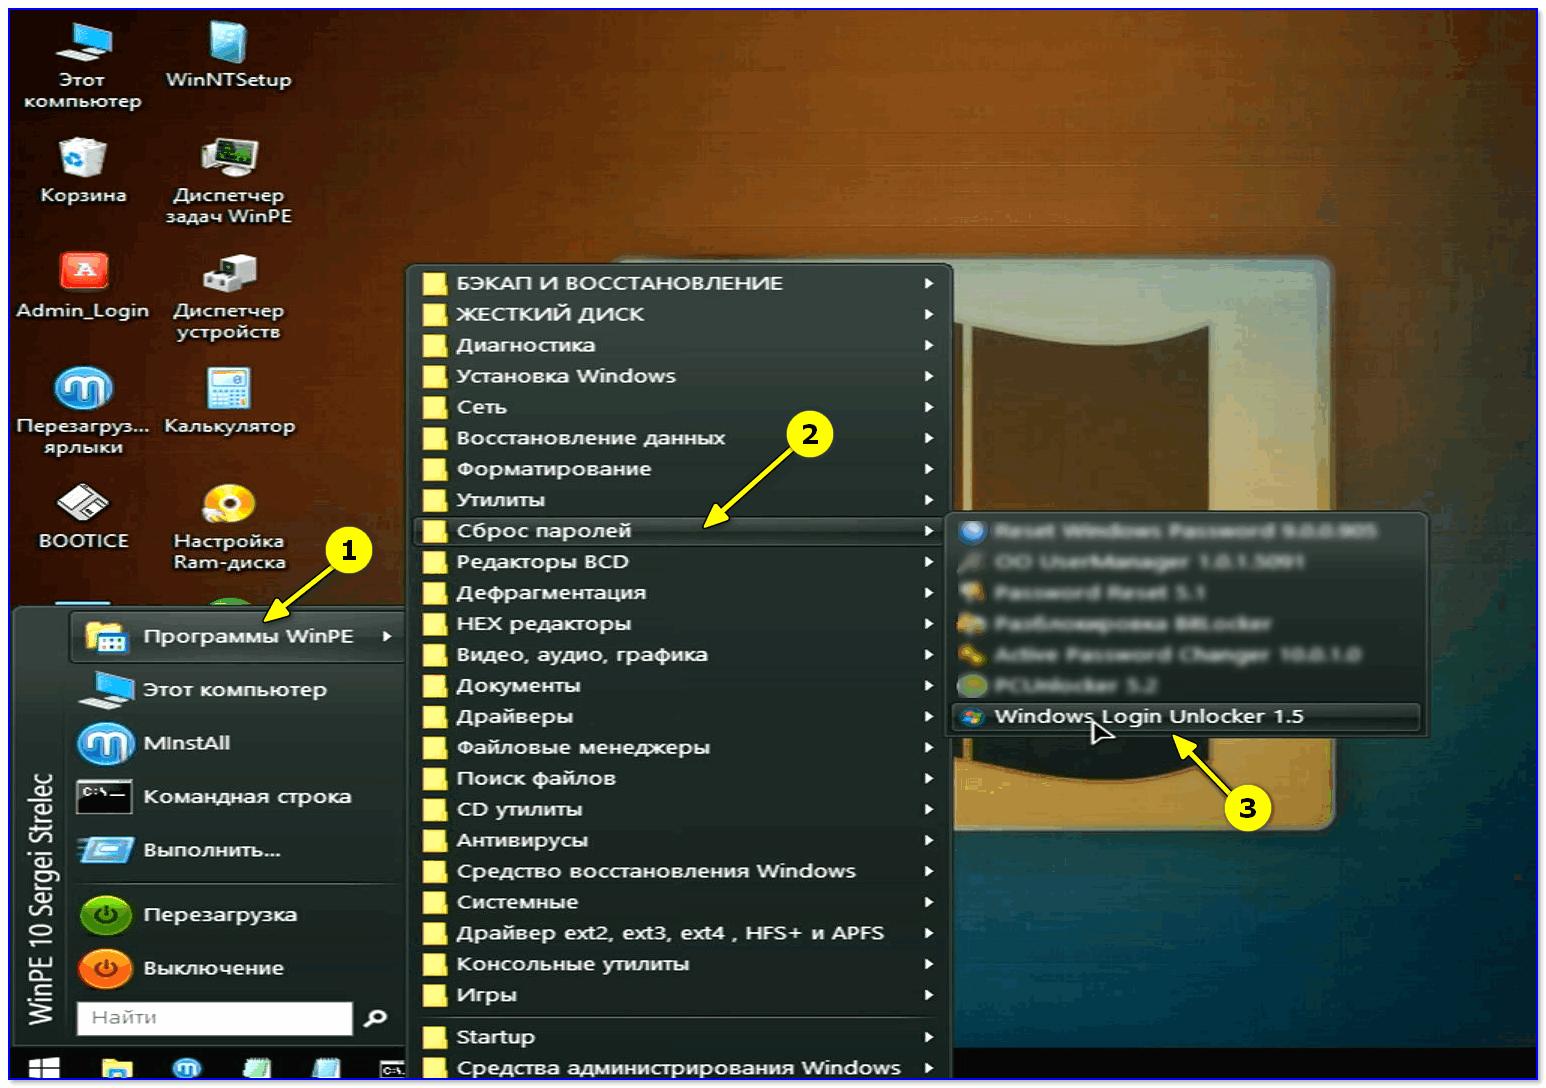 Windows-login-Unlocker-----zagruzochnaya-fleshka-ot-Streltsa.png